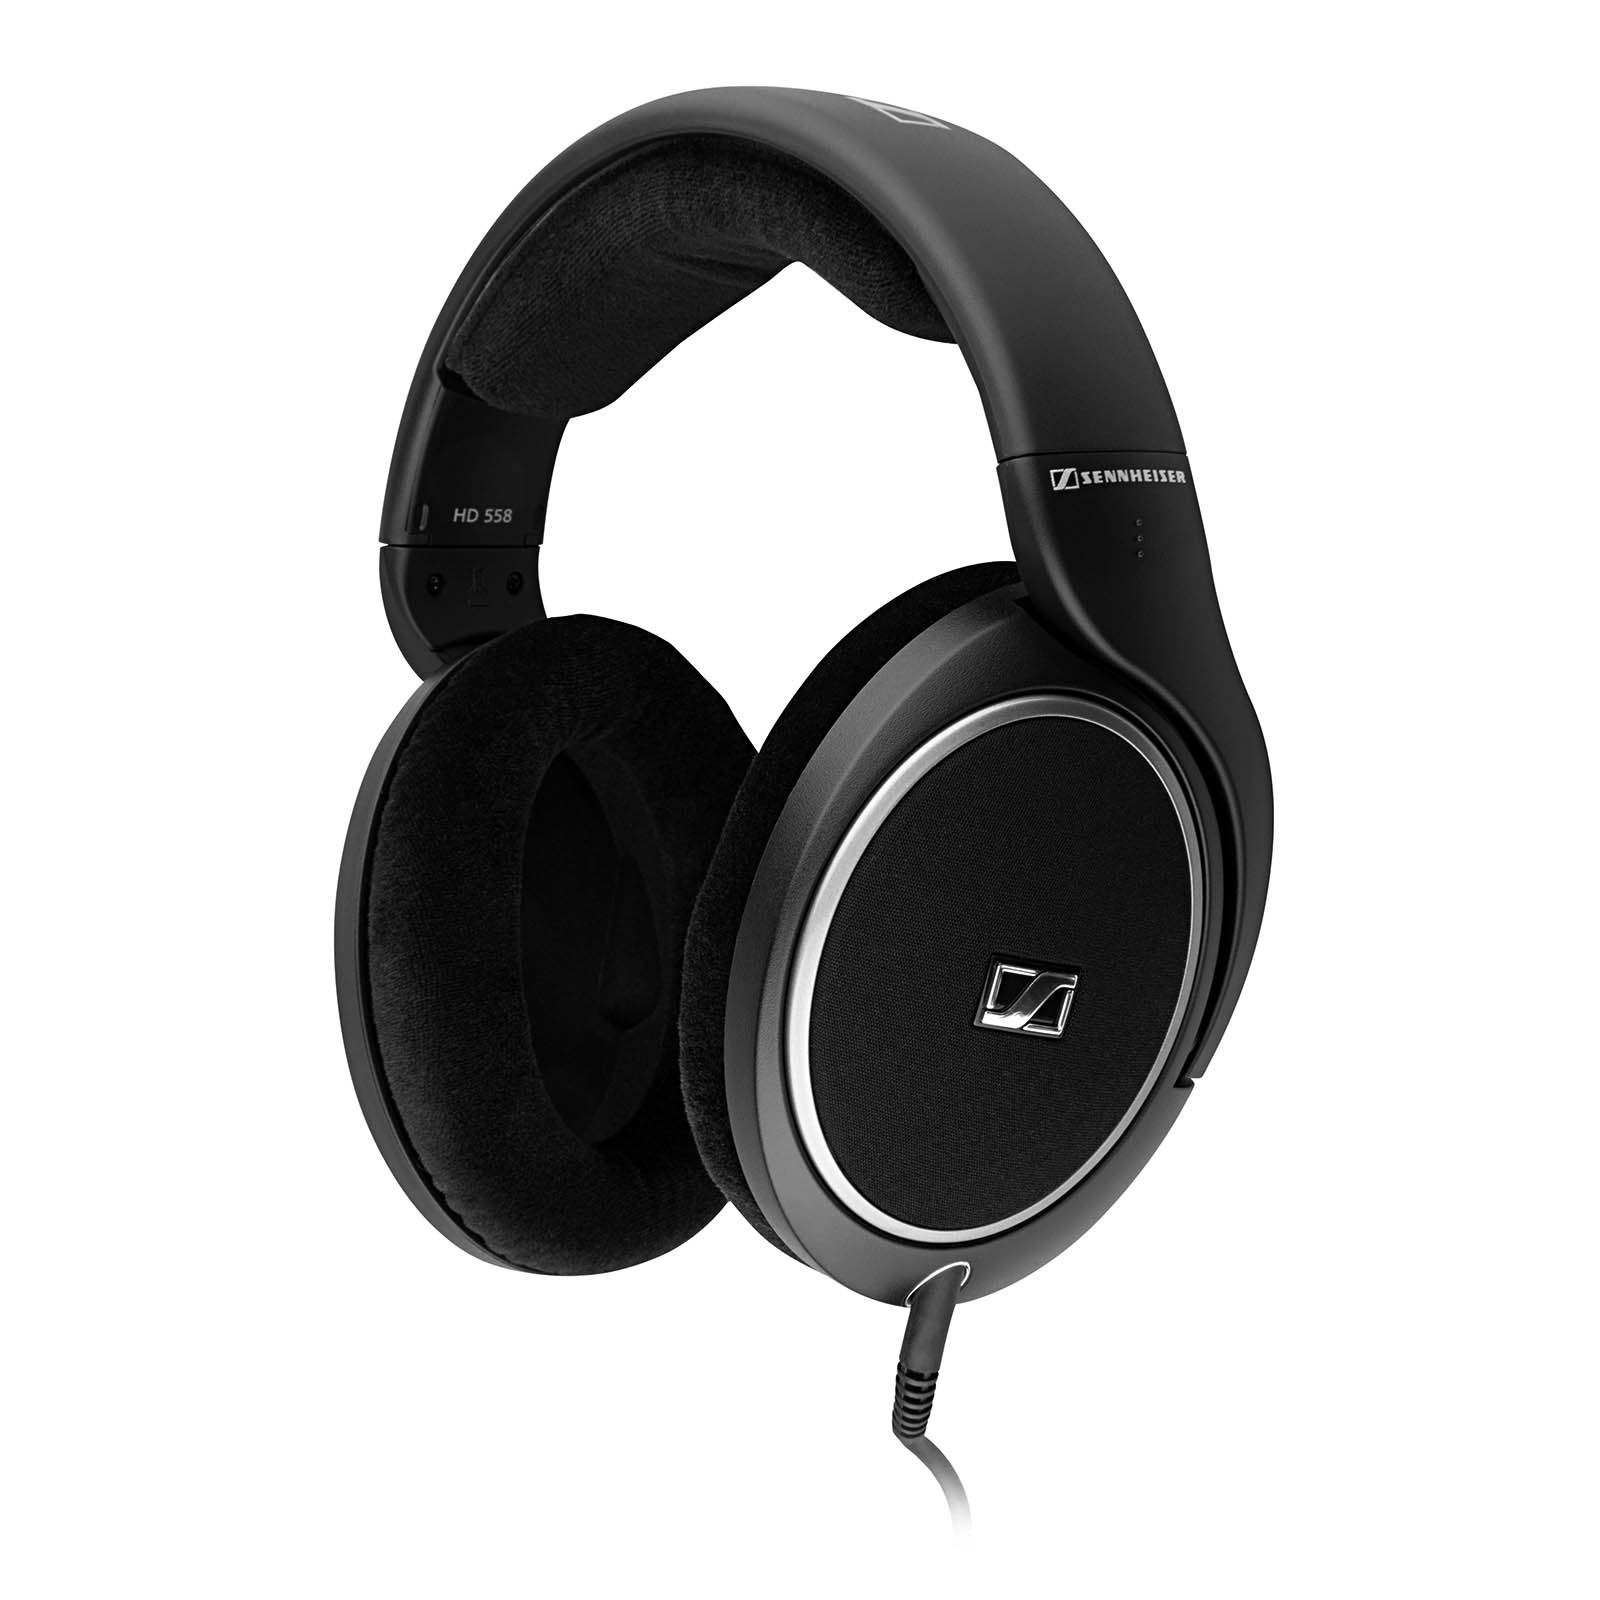 Sennheiser HD 558 Over the Ear Headphones Black by Sennheiser